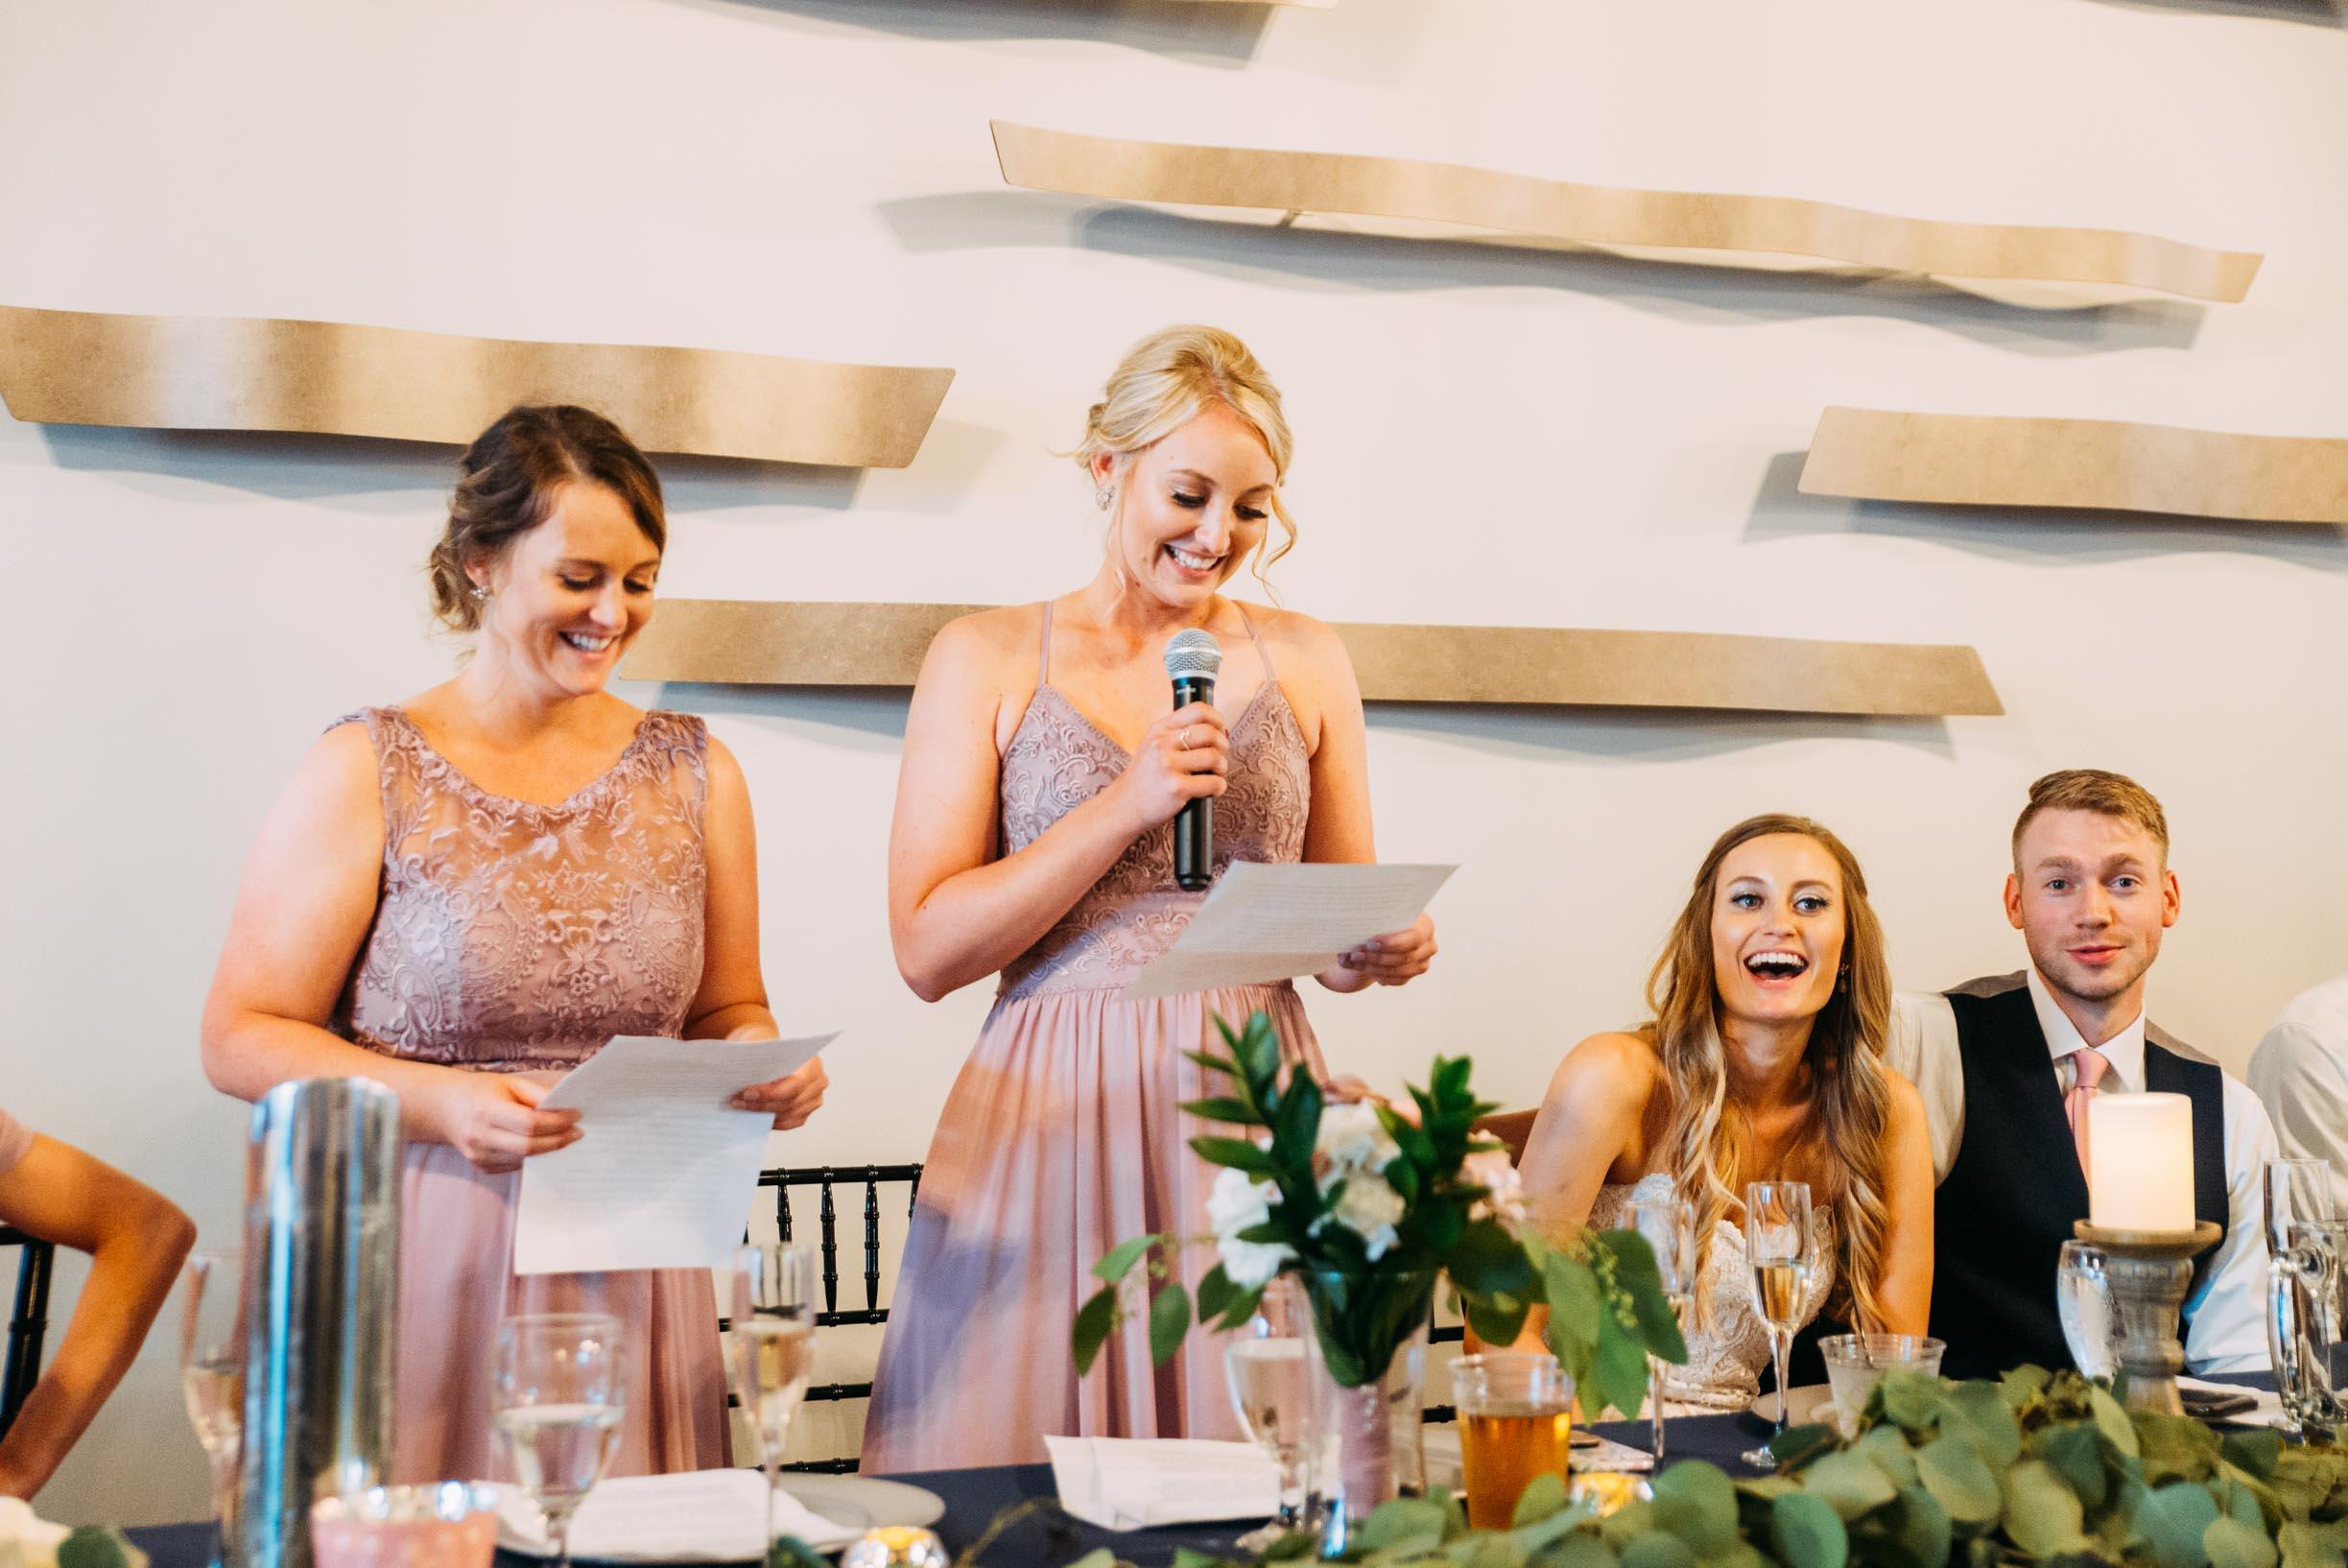 67-WeddingsattheBroz_Minnesota_WeddingBlog_Reception.jpg